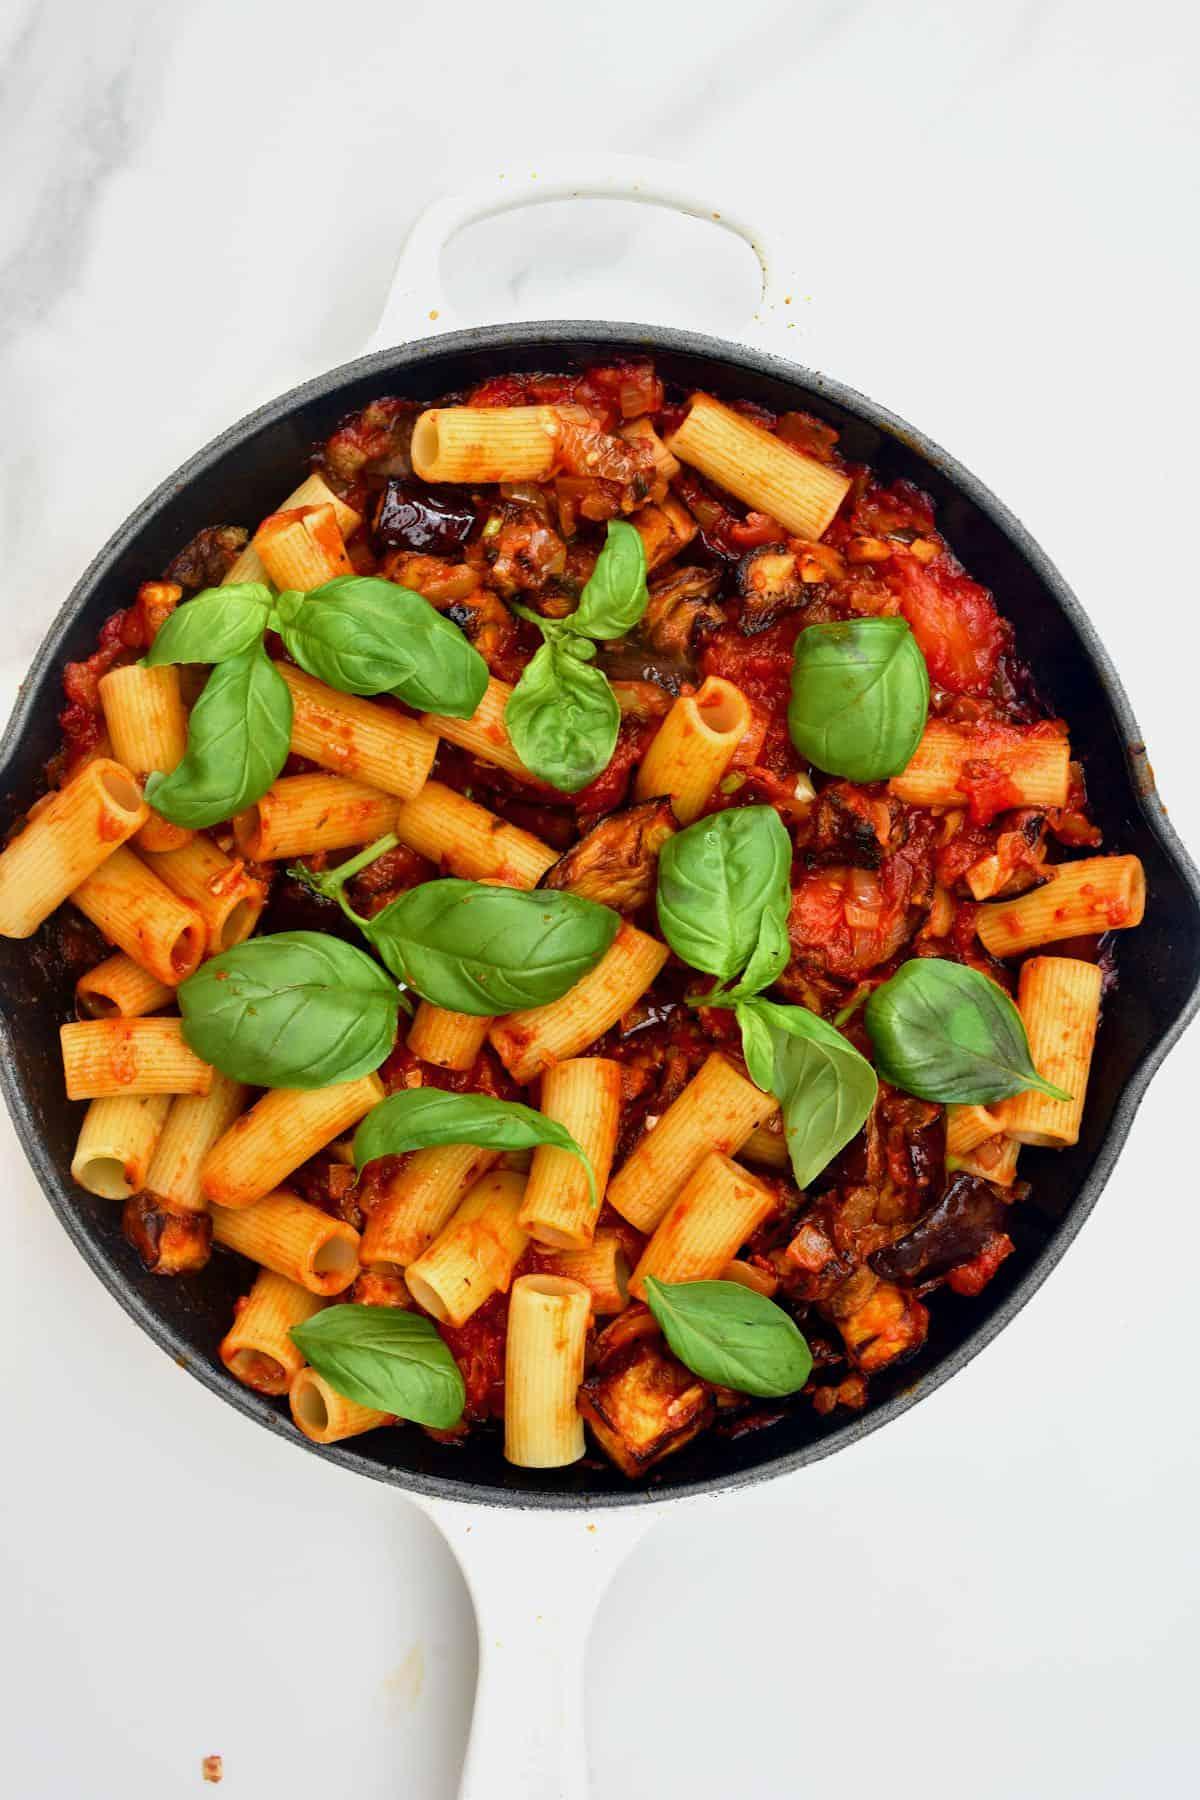 Tomato eggplant pasta in a pan